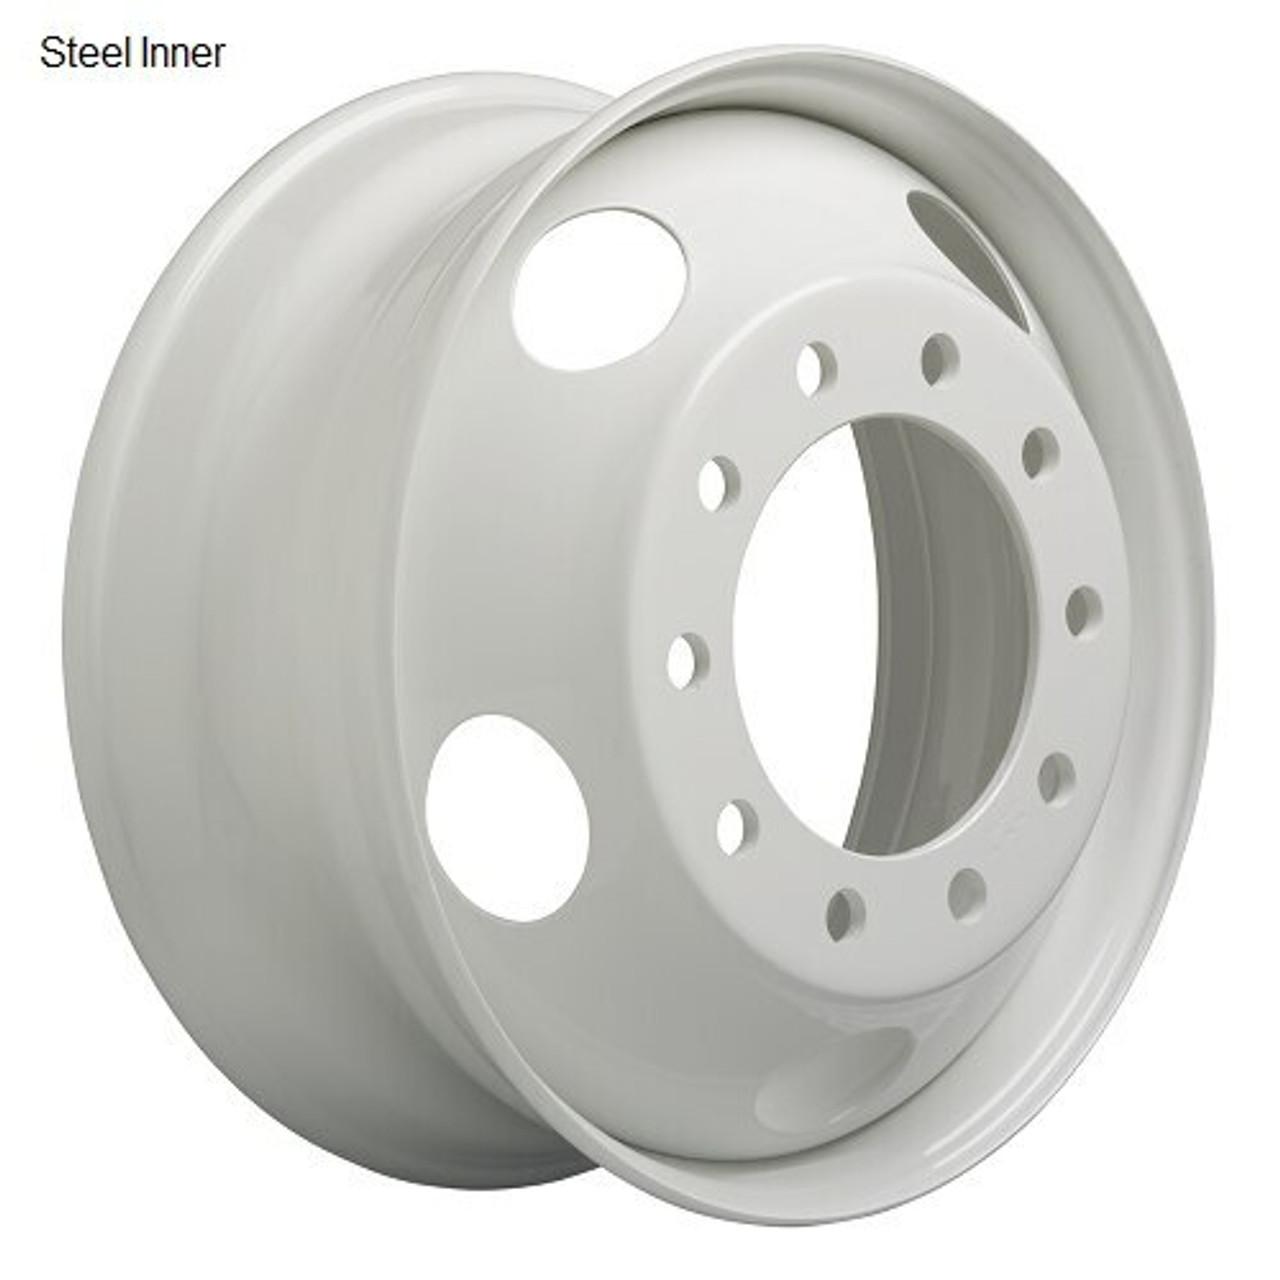 22.5 x 8.25 Alcoa Steel